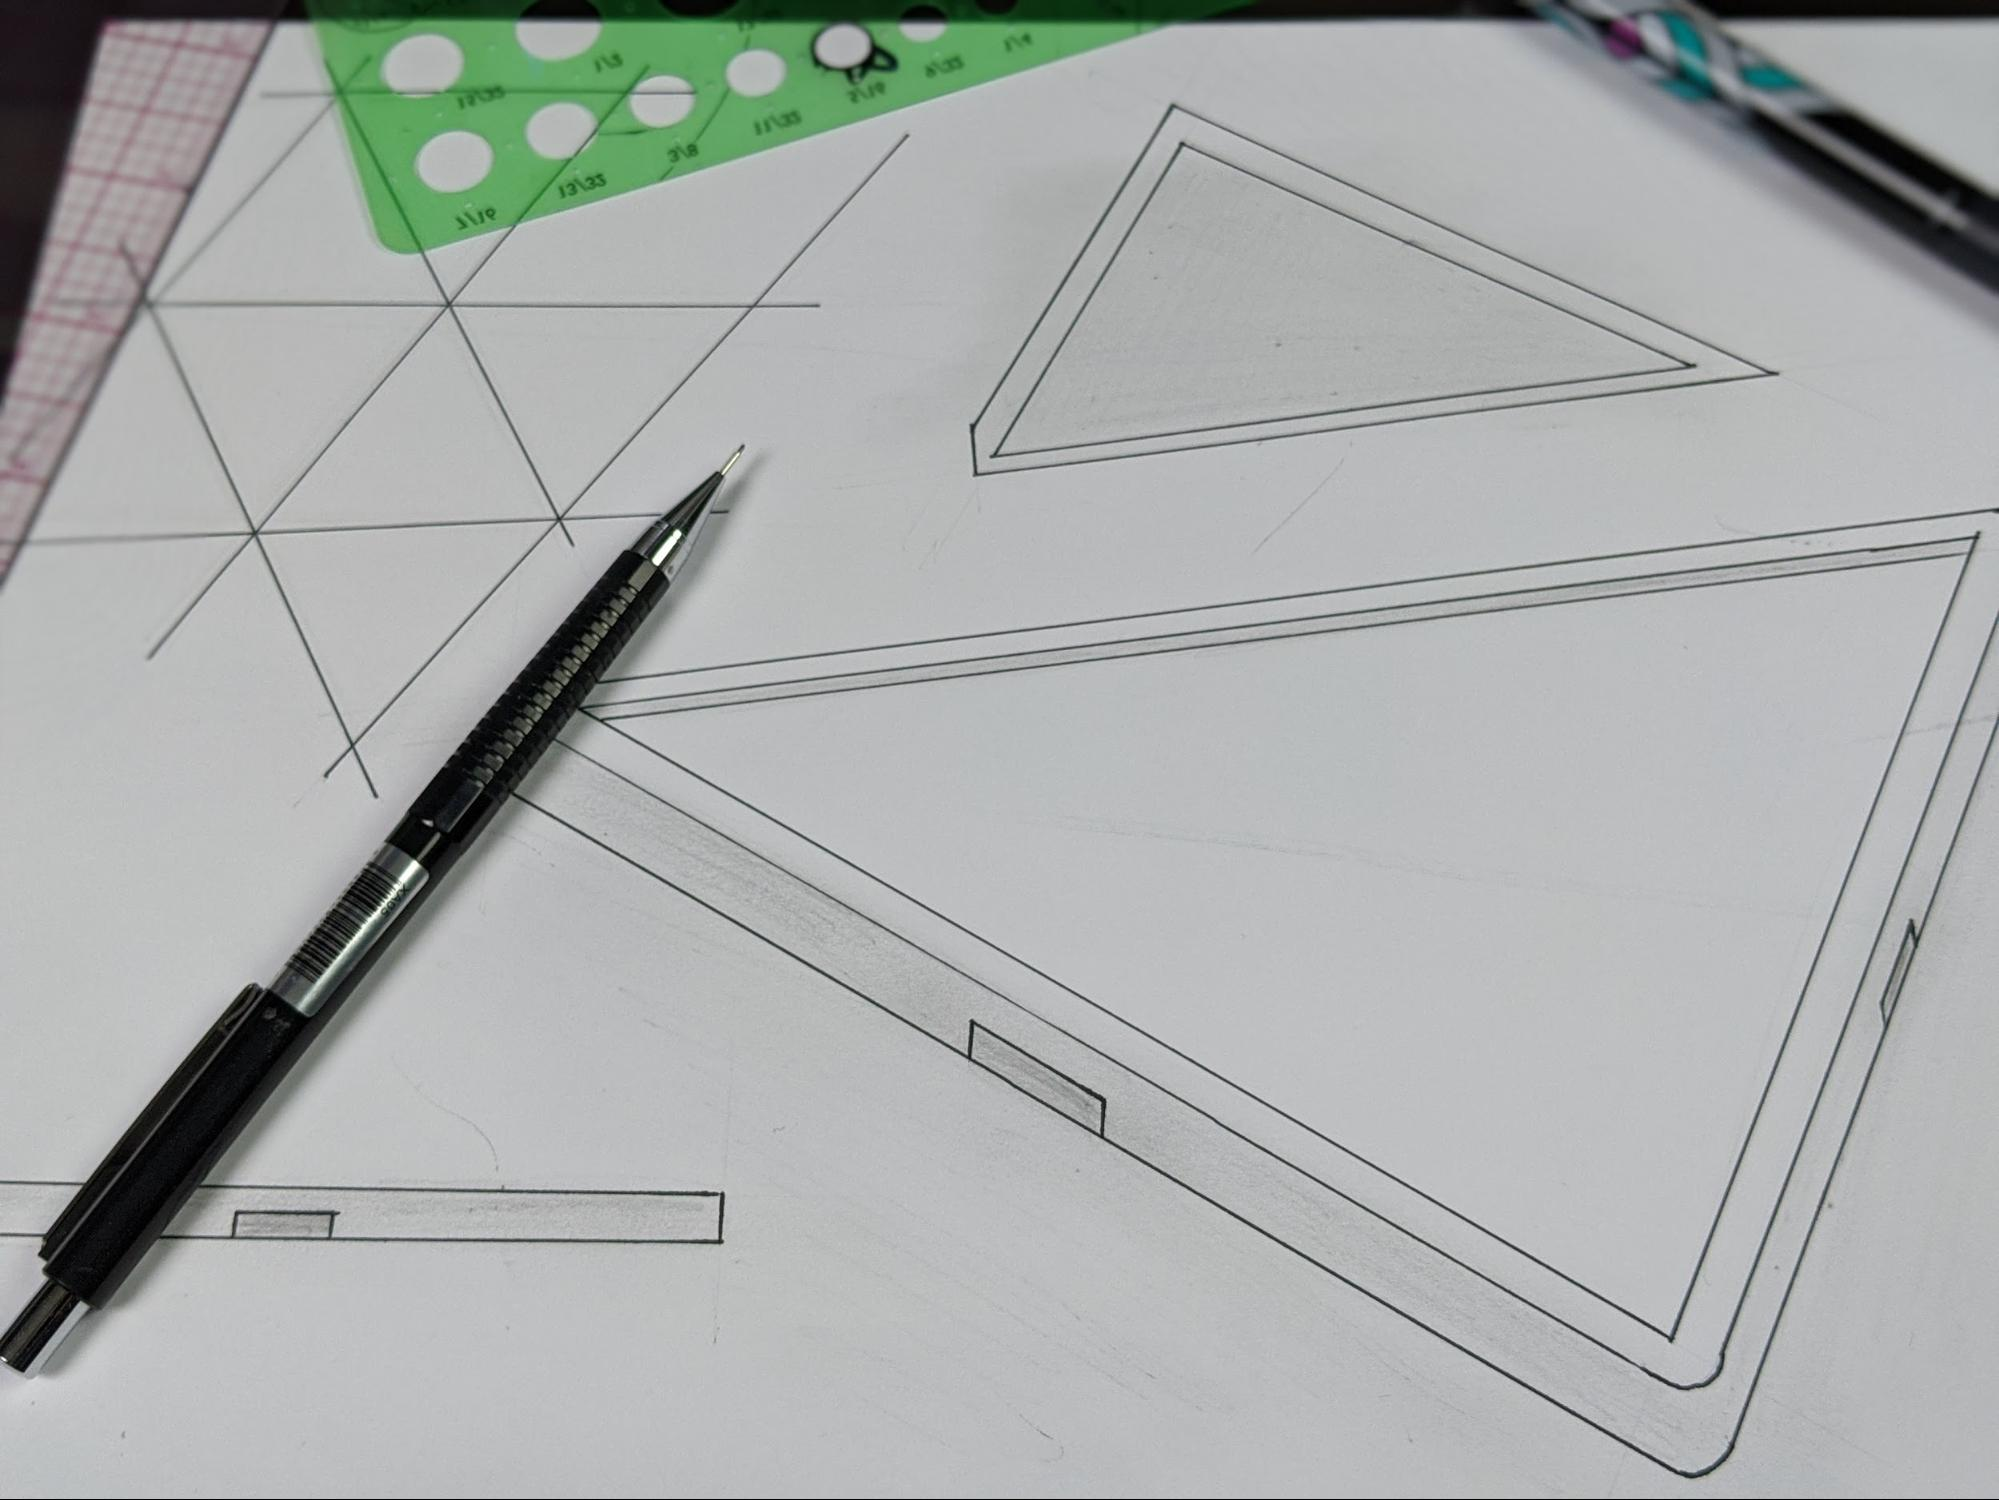 Start_Prototyping_SH_MP_image1.jpg